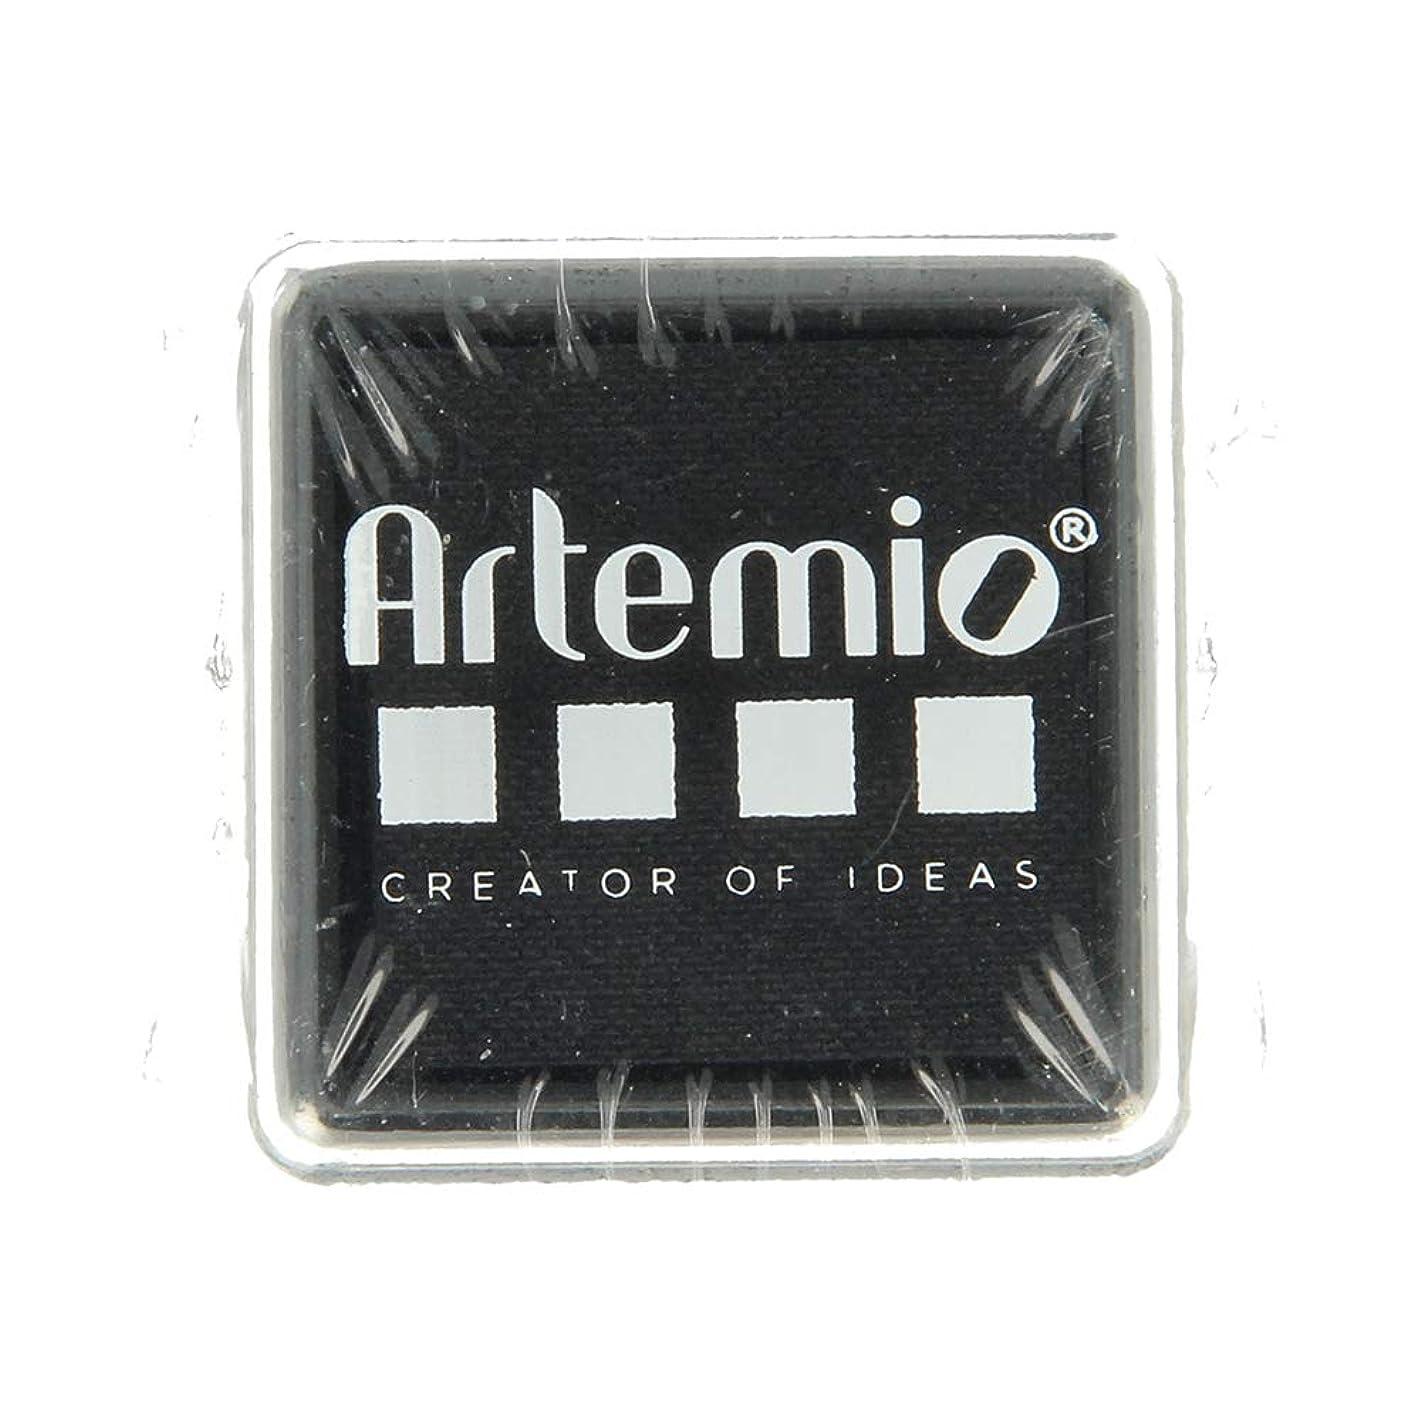 Artemio Slow Drying Ink, Ink, Black, 2?x 3?x 3?cm